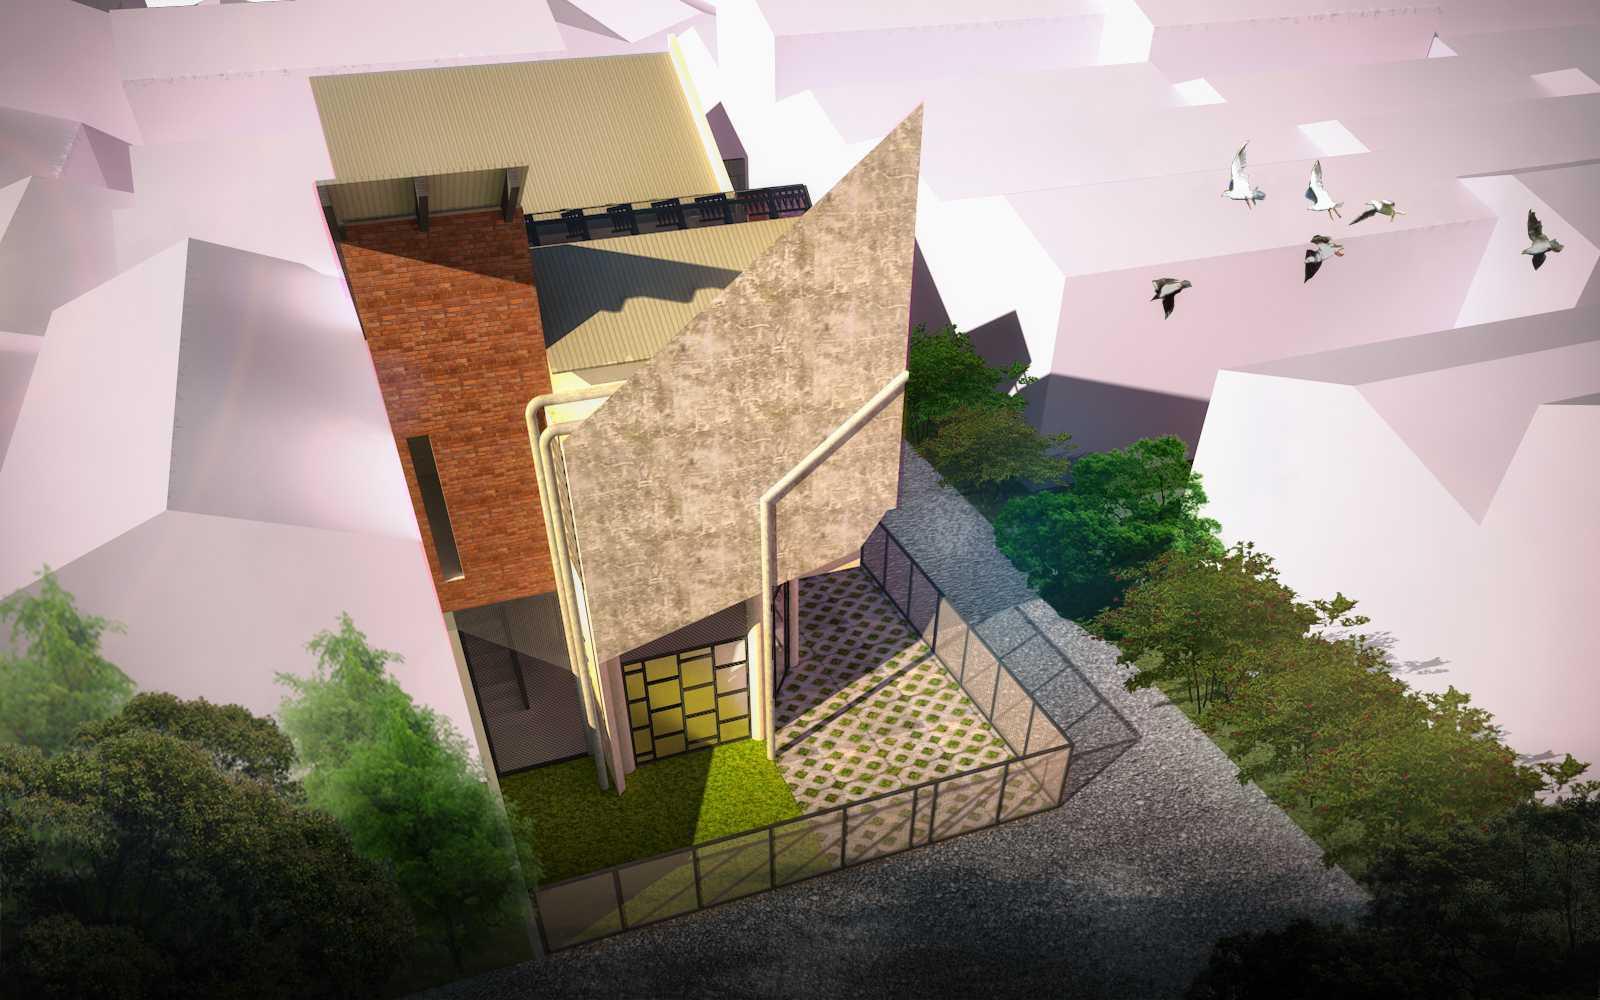 Indoneosian Architect Menjulang Tinggi Surabaya, Kota Sby, Jawa Timur, Indonesia Surabaya, Kota Sby, Jawa Timur, Indonesia Studioindoneosia-Menjulang-Tinggi  60946